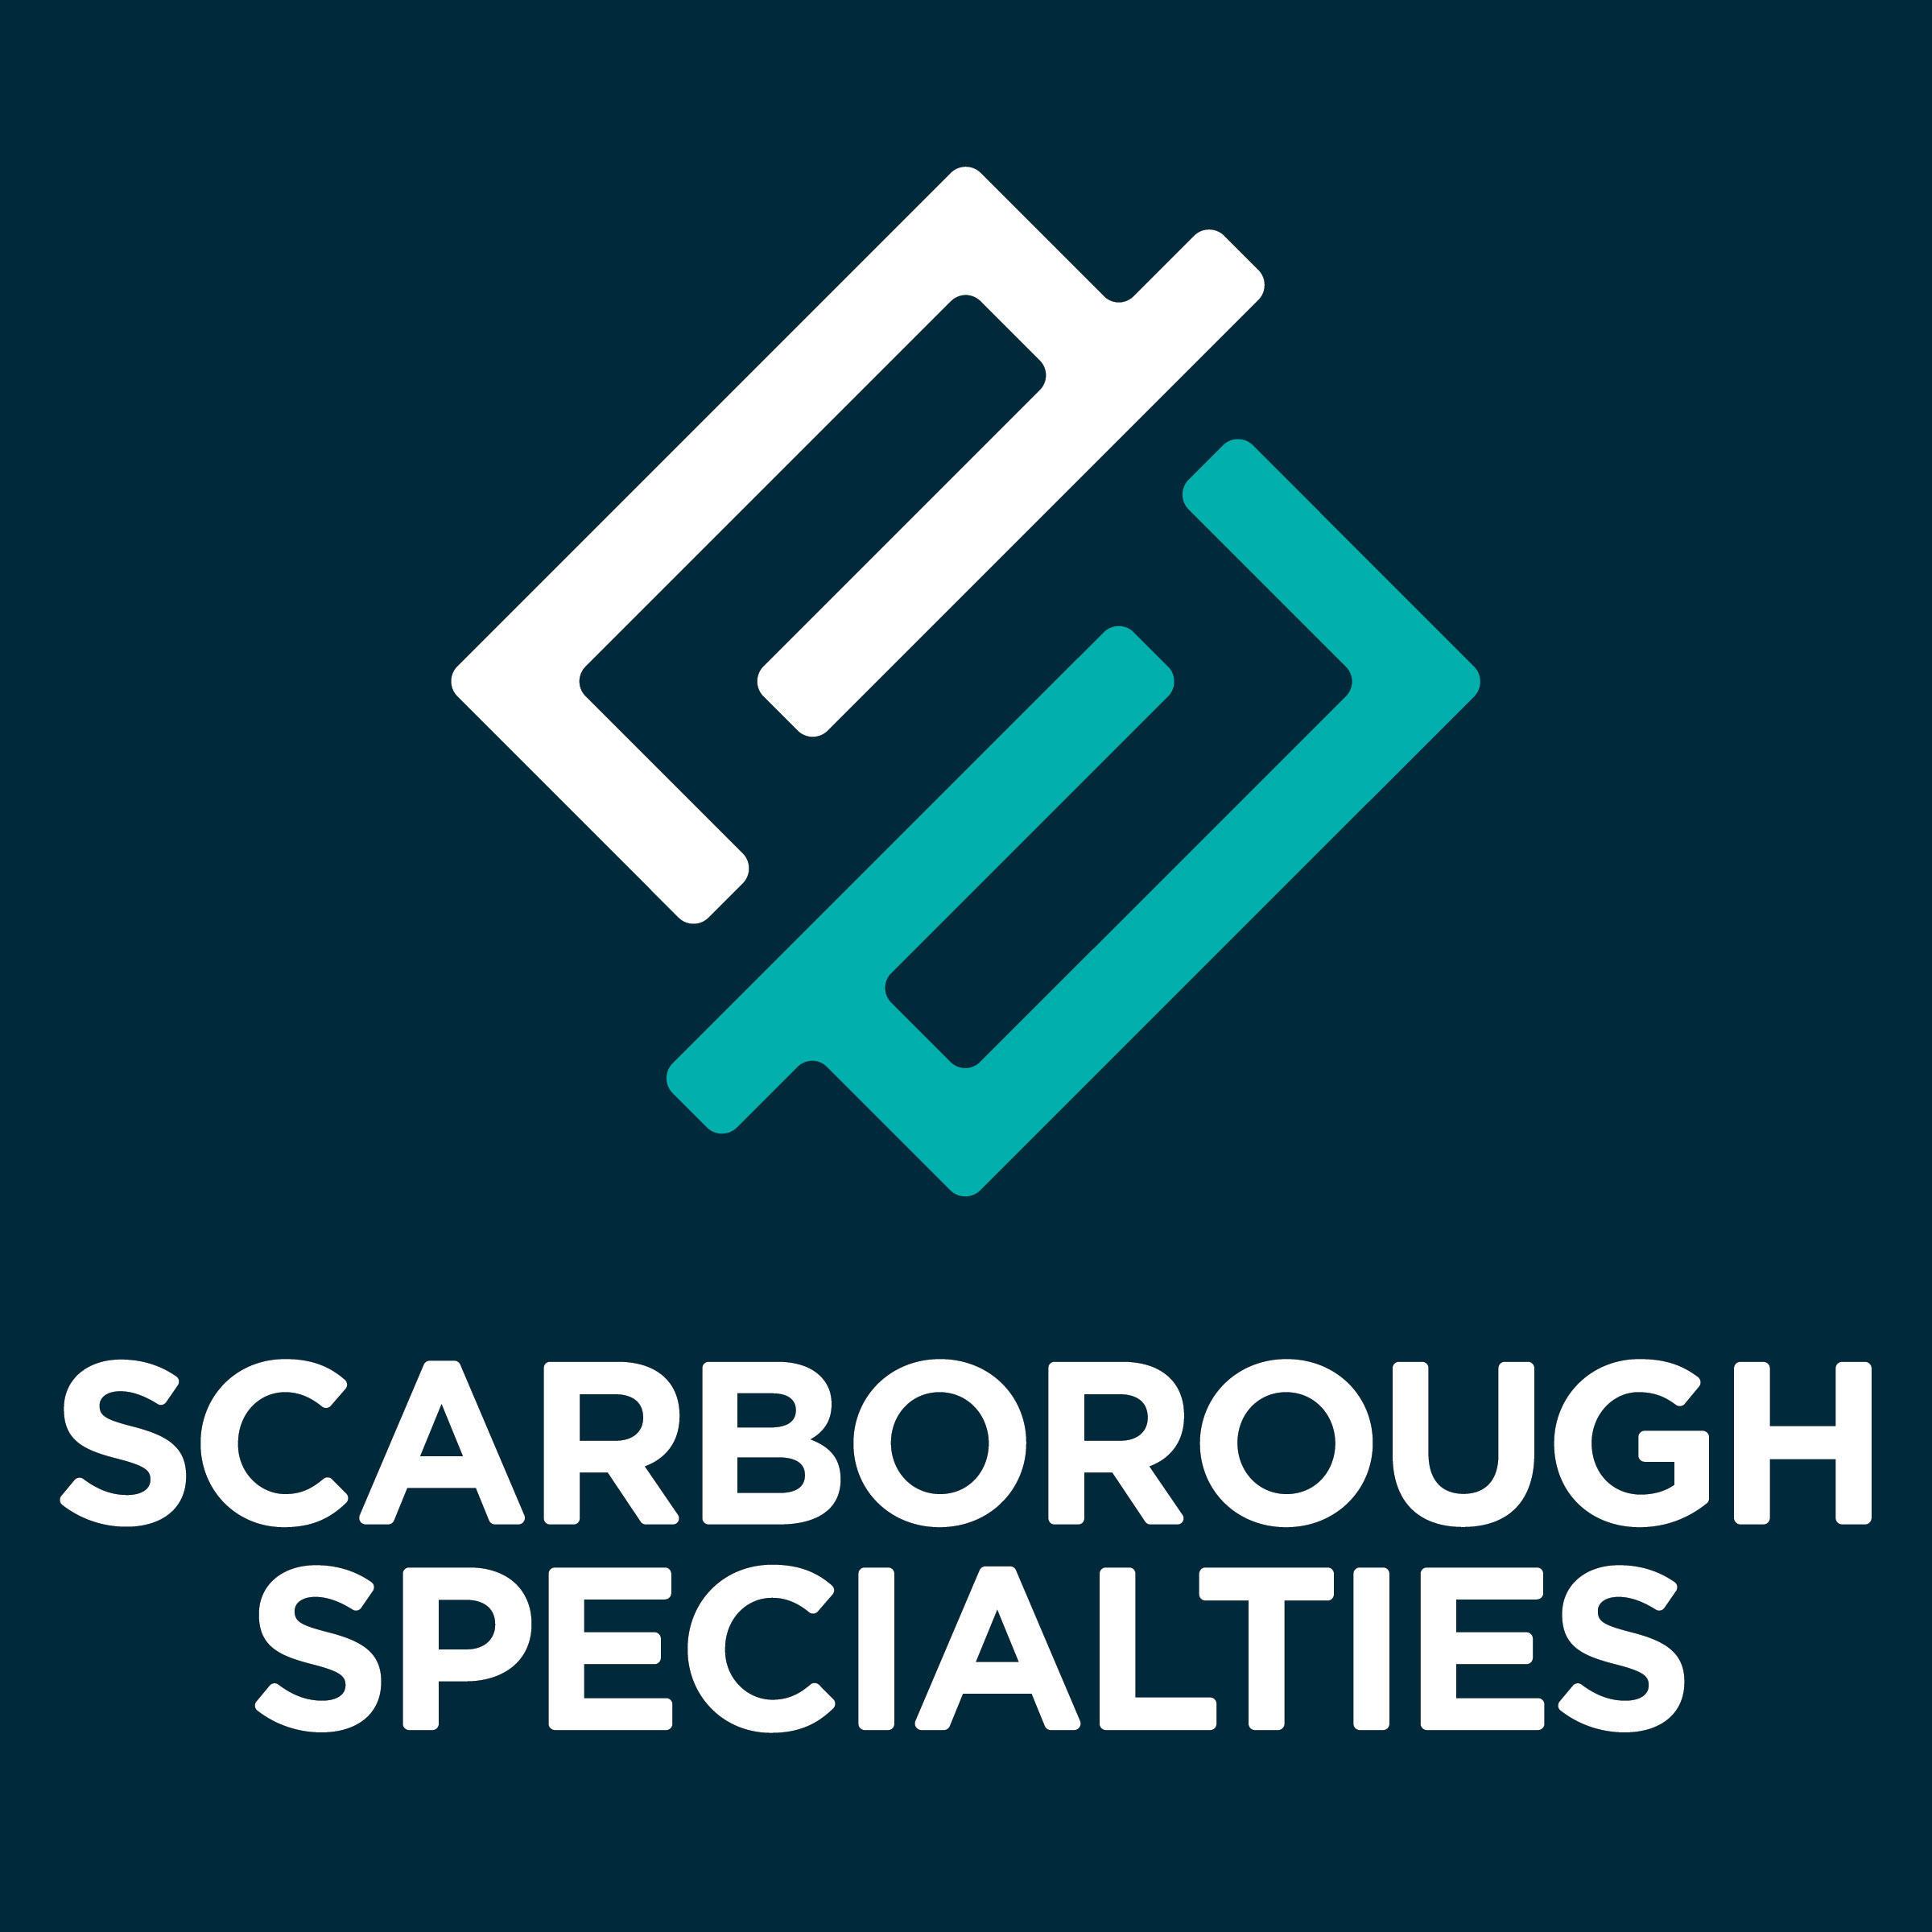 Scarborough Specialties - Waco, TX 76712 - (254)235-1515 | ShowMeLocal.com